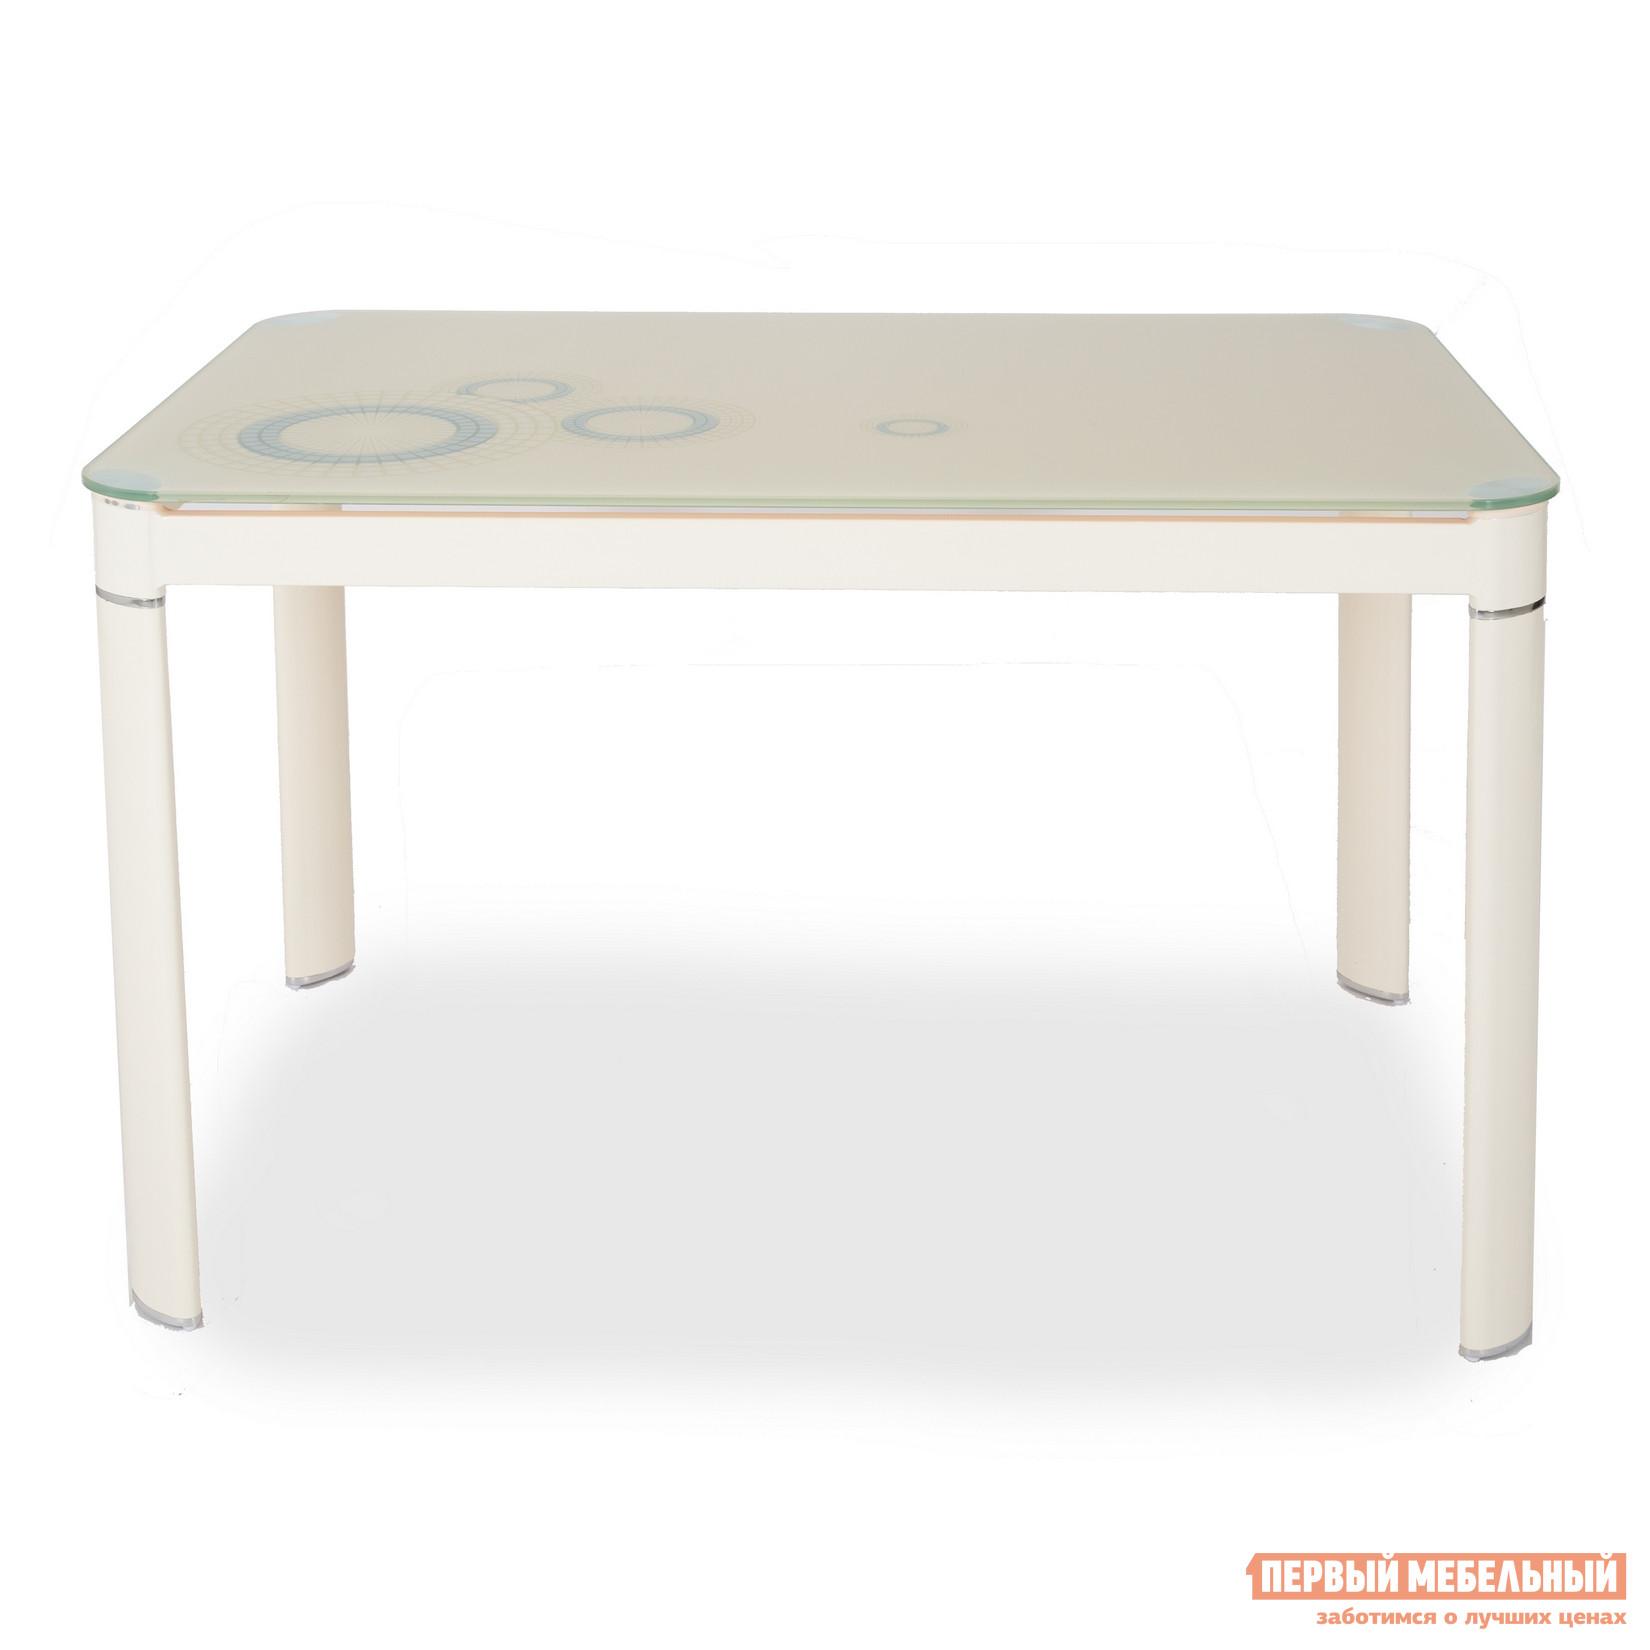 Обеденный стол Бентли Трейд S12 LIGHT BEIGE